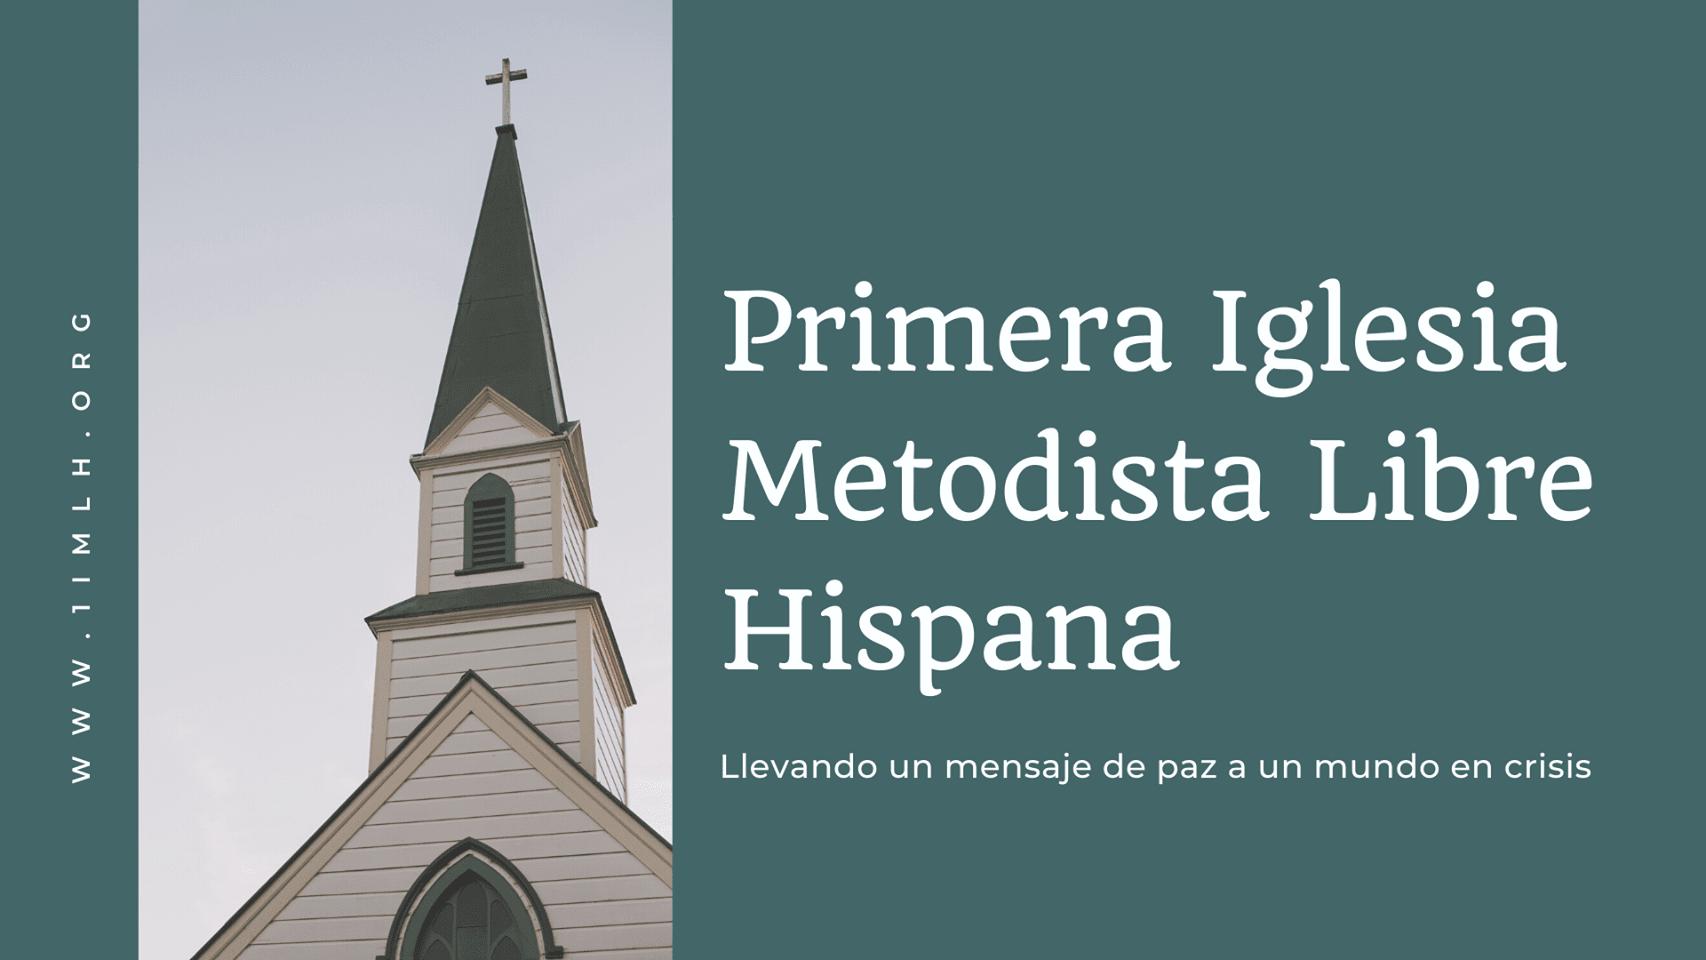 Free Spanish Methodist Church Pantry